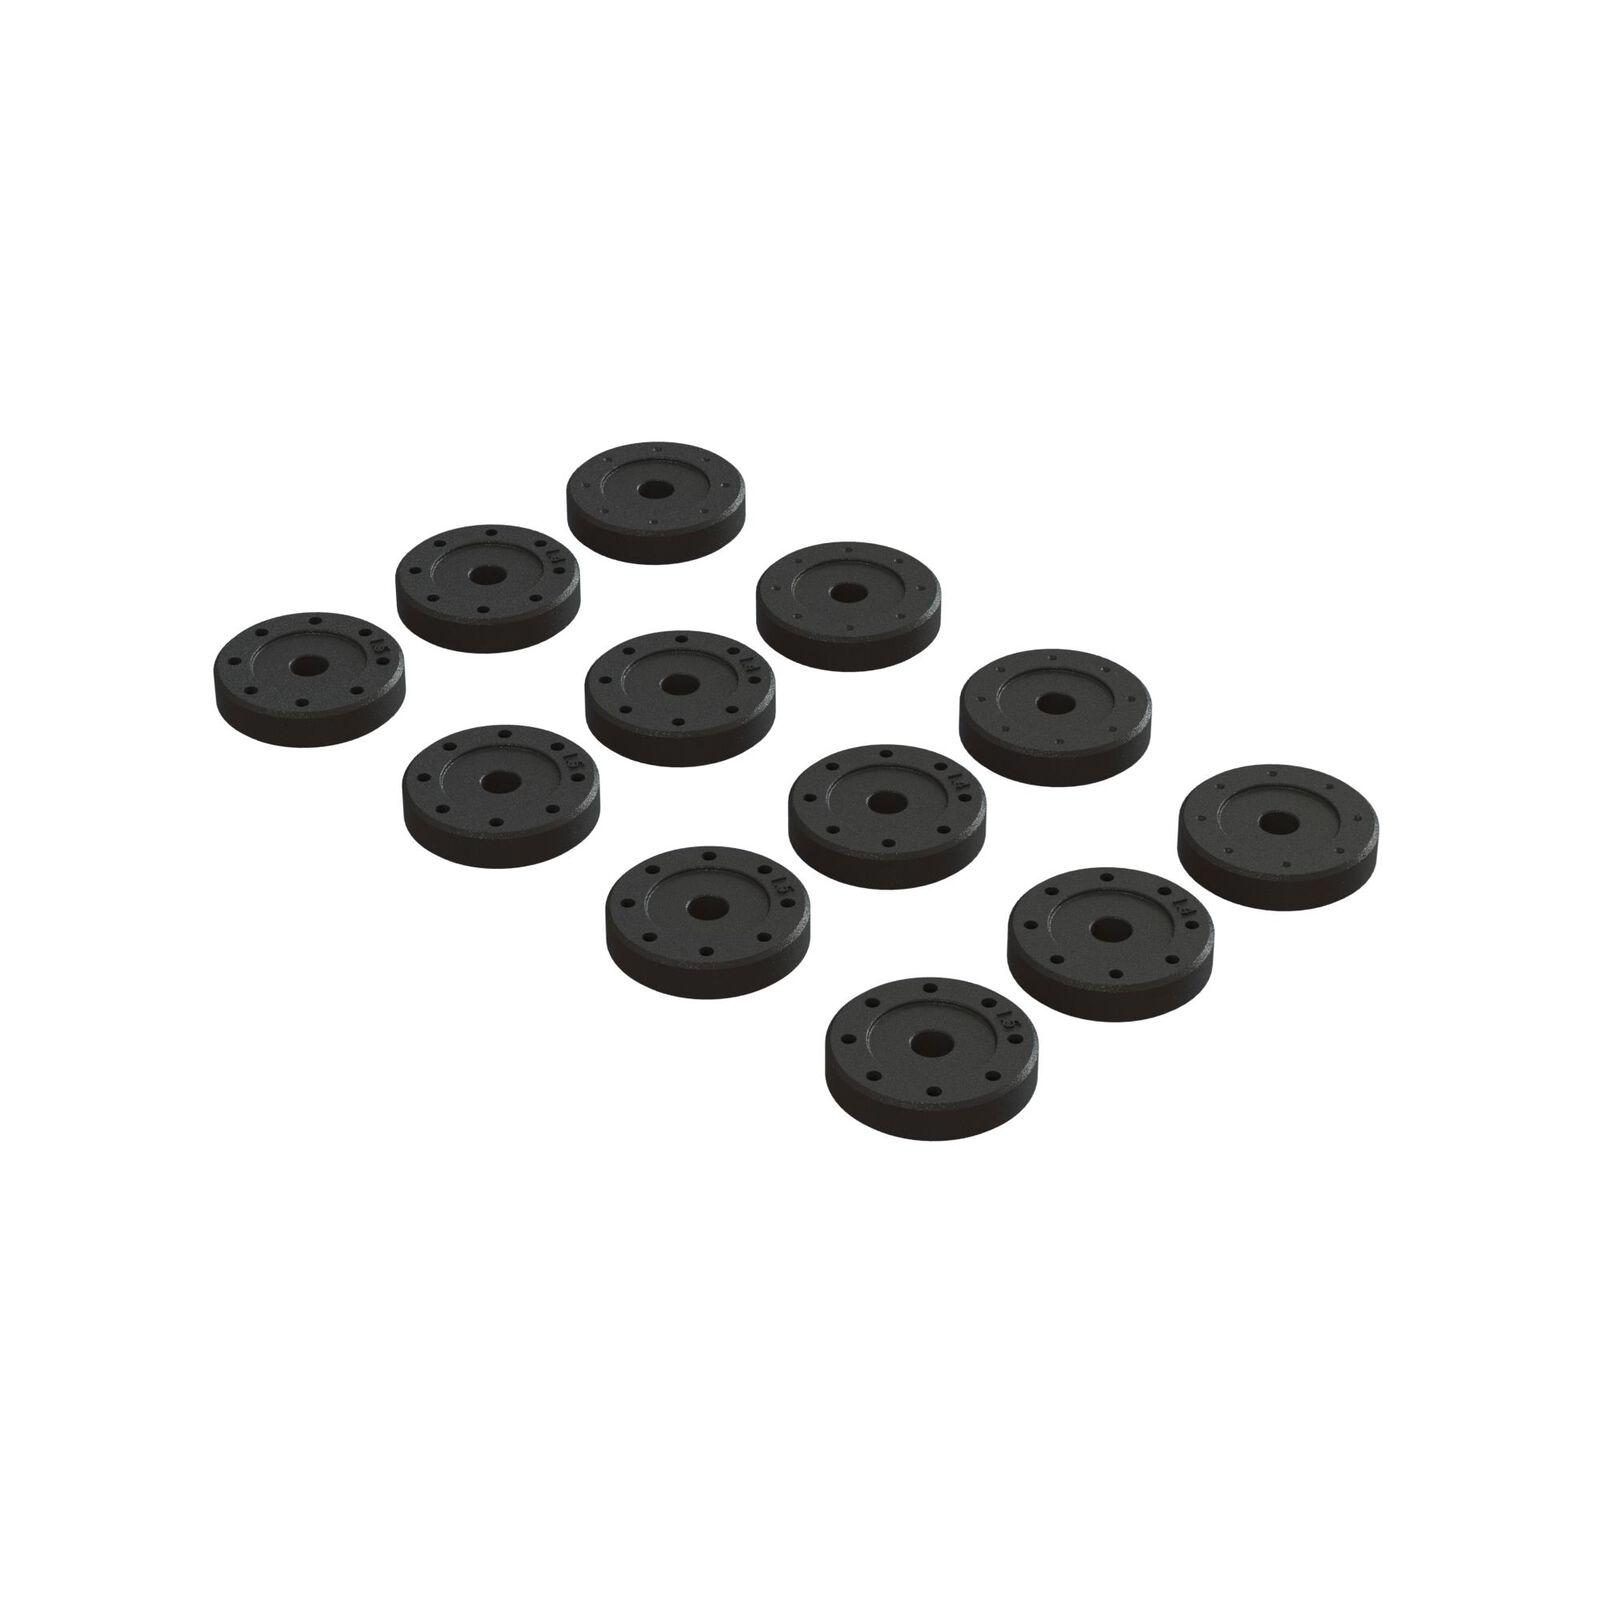 Shock Piston Set: 1.4mm (8), 1.5mm (8), Blank (4)